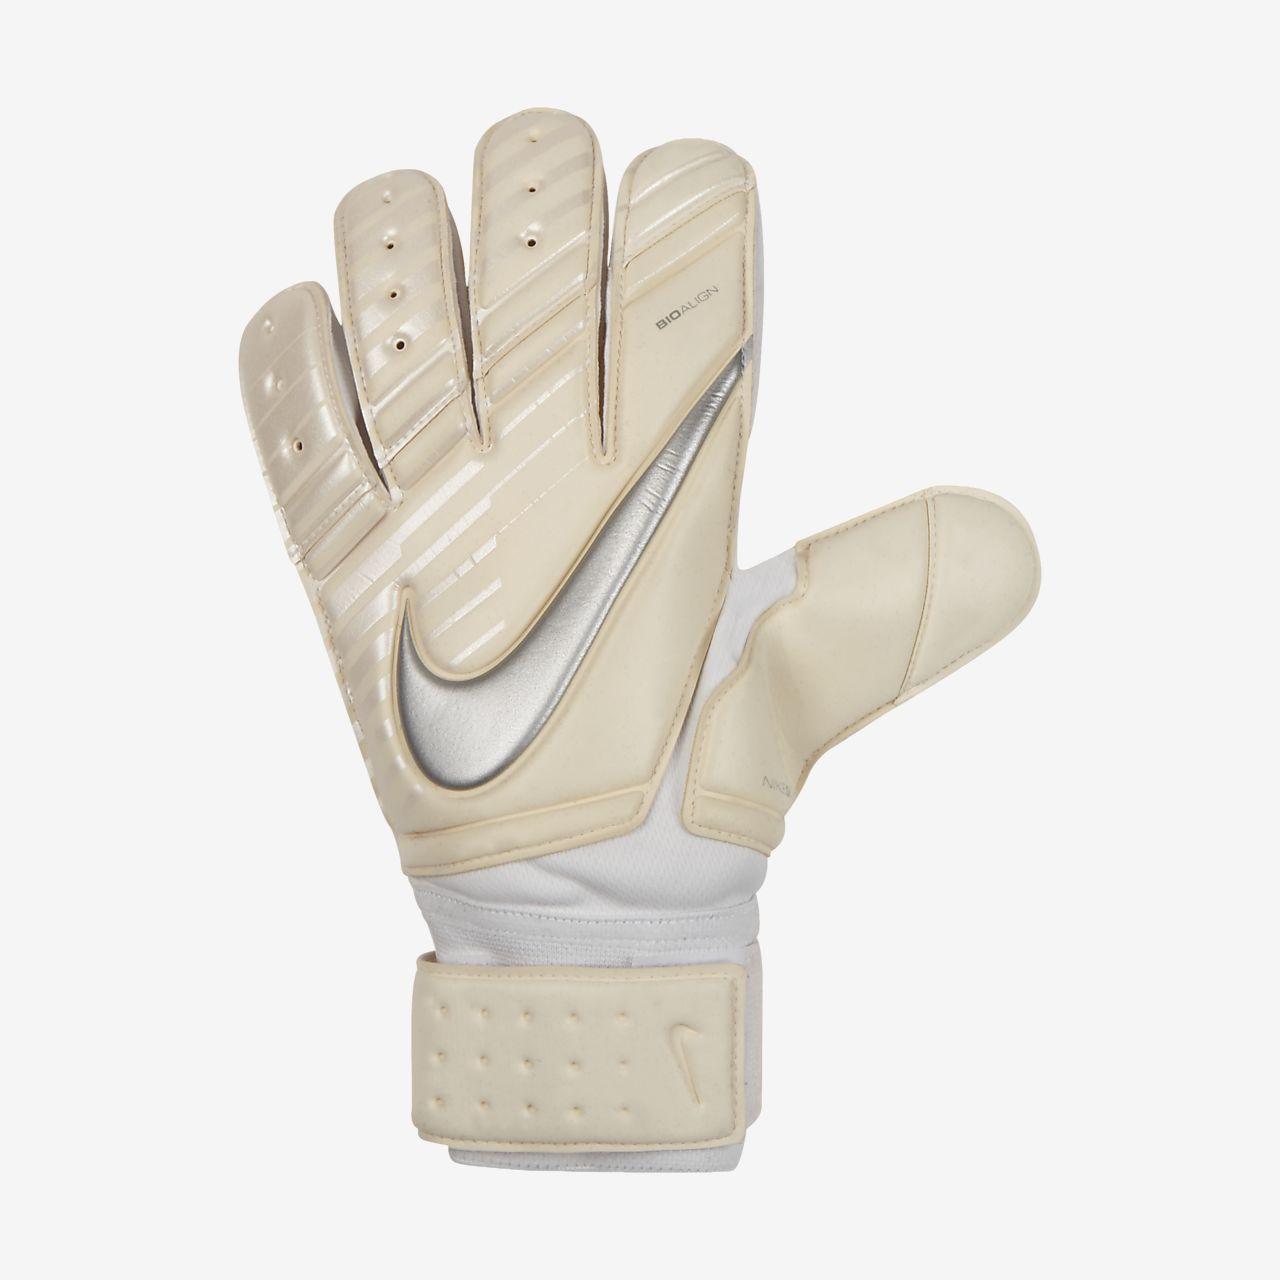 Nike Premier Grip3 Goalkeeper Football Gloves